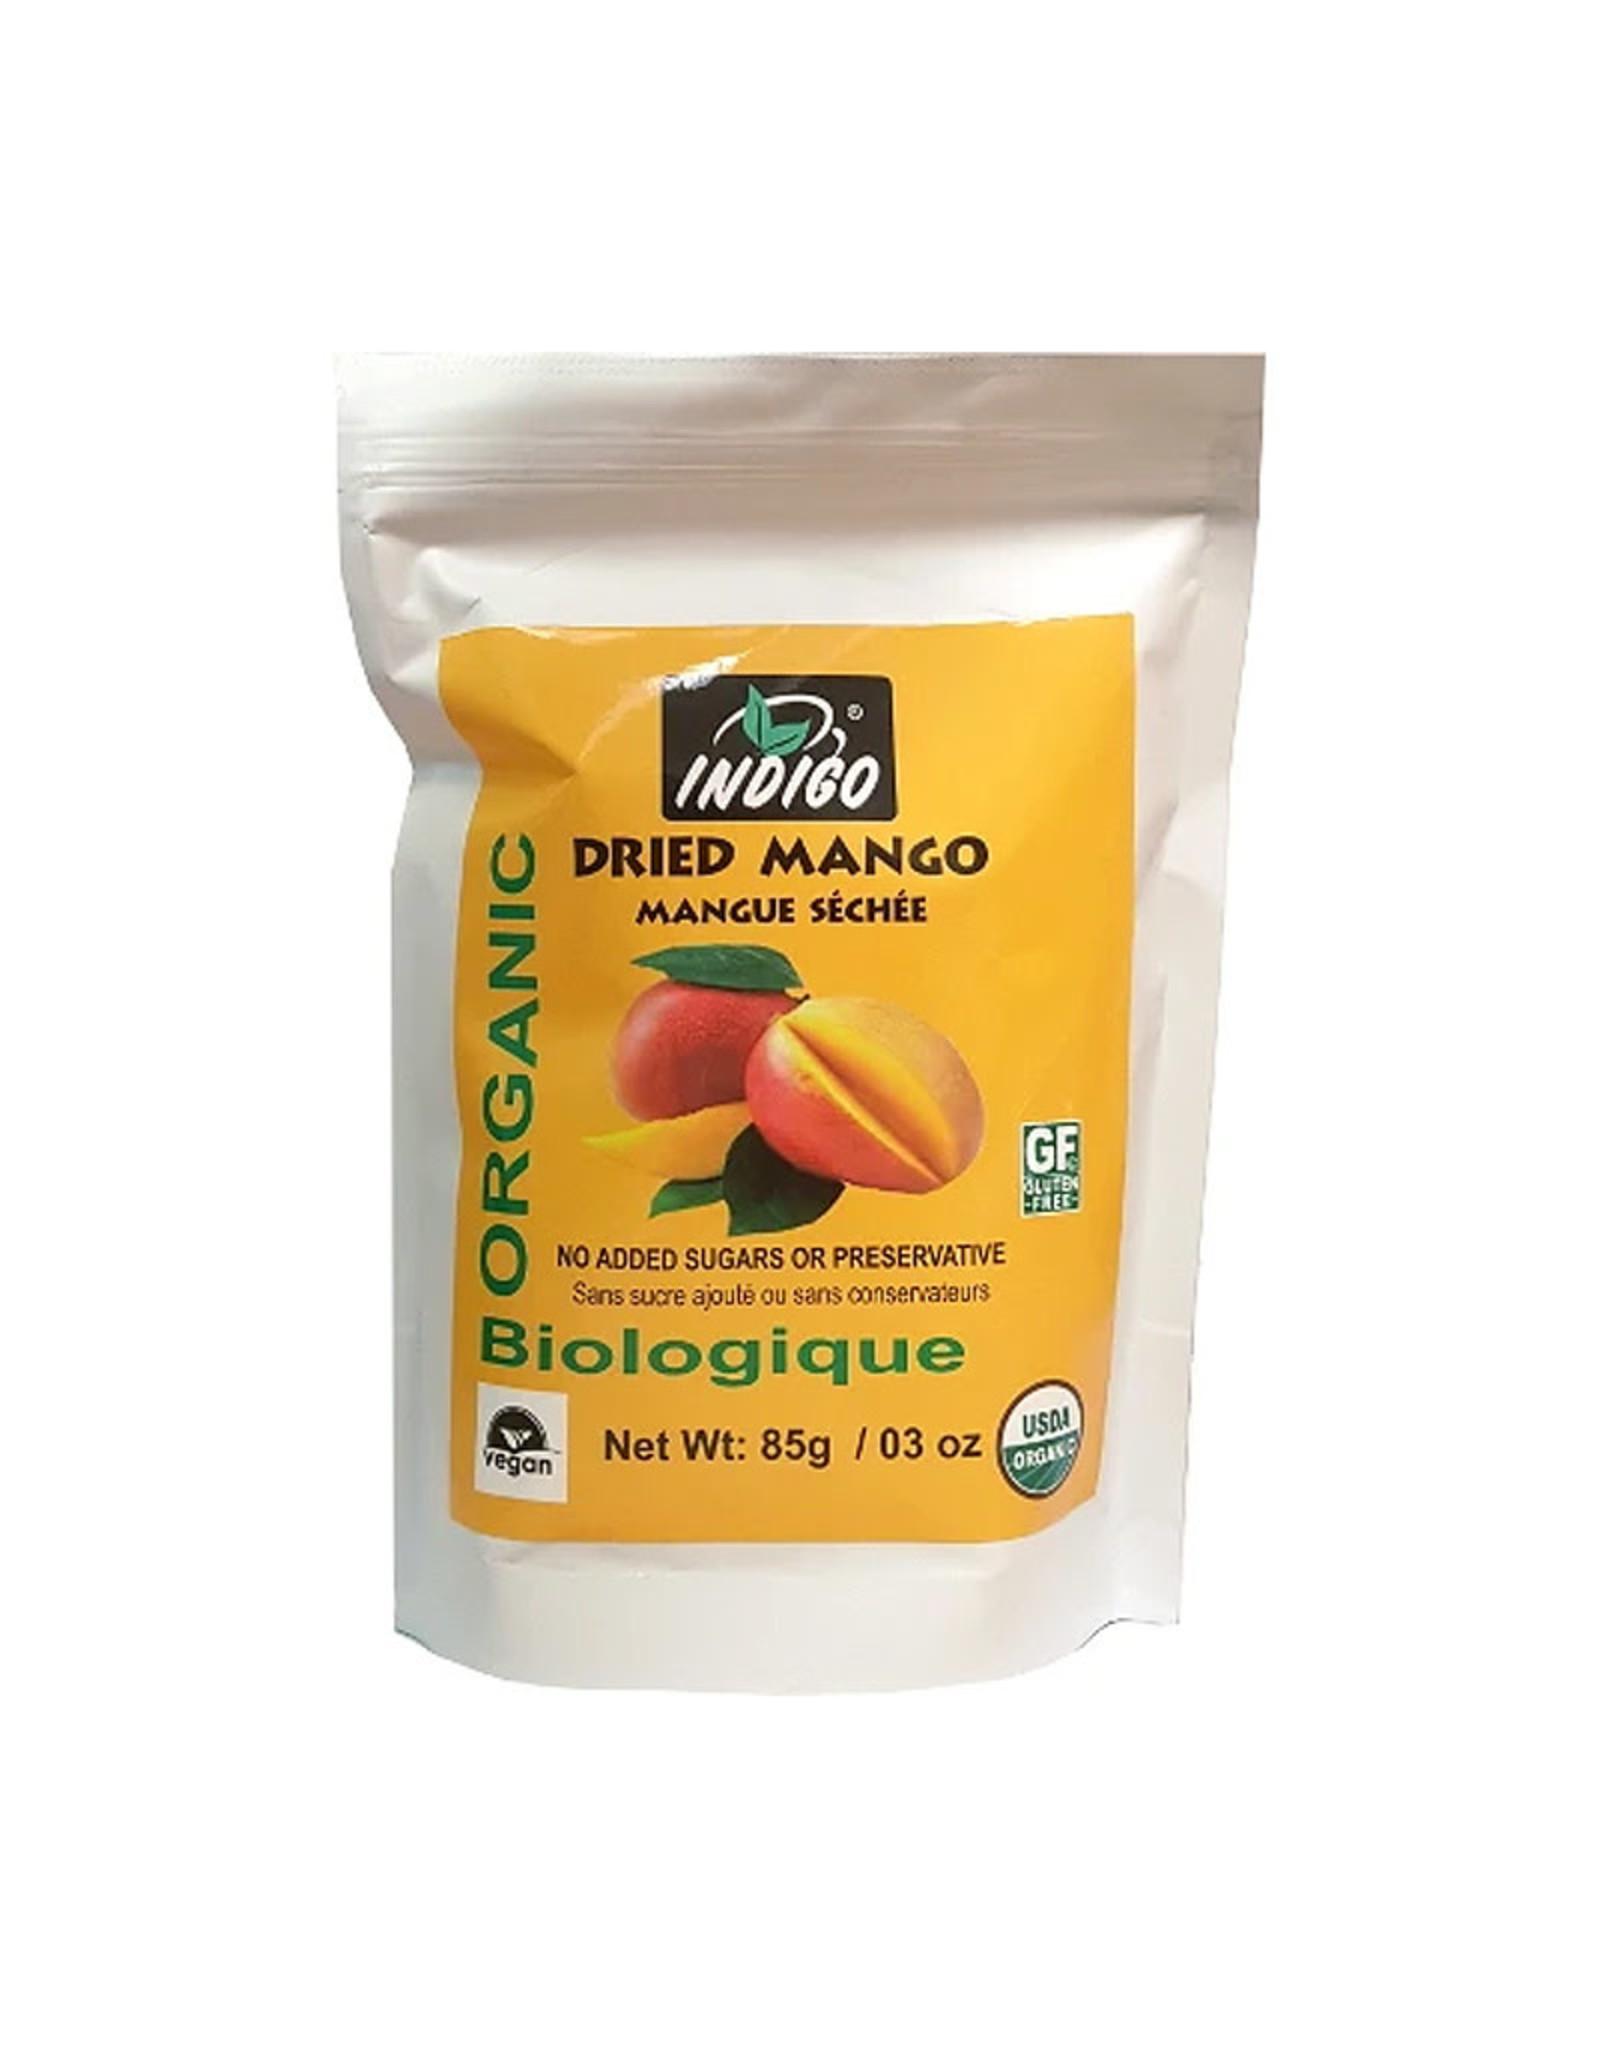 Indigo Indigo - Organic Dried Mango (85g)